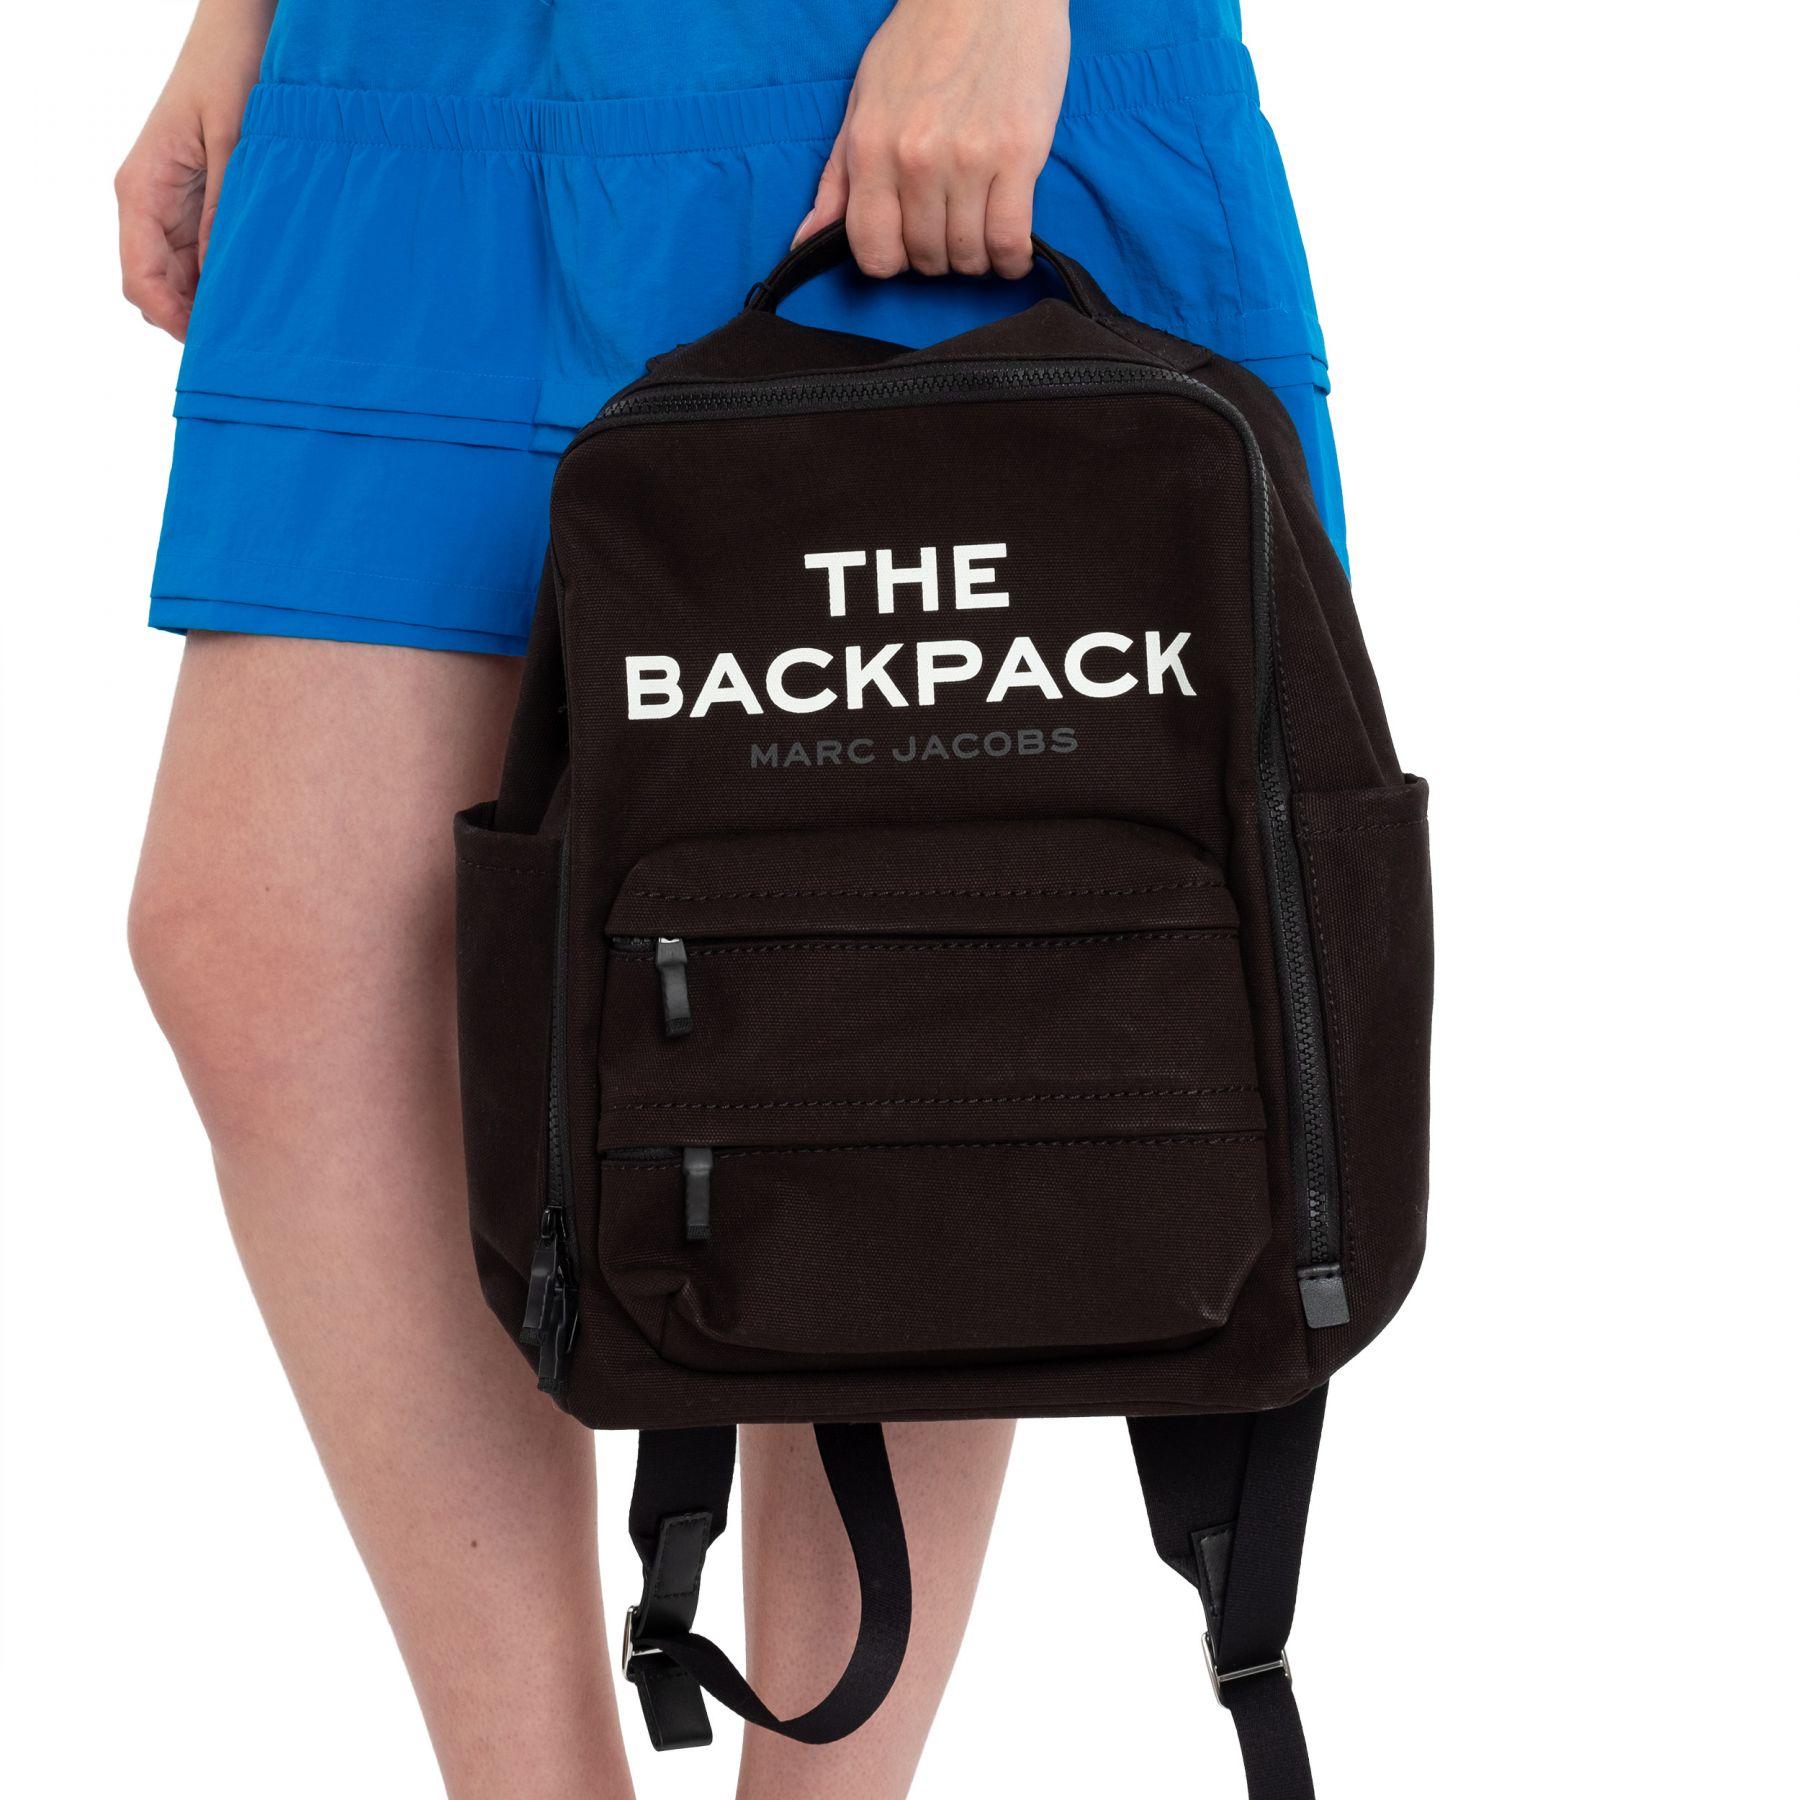 Рюкзак Marc Jacobs THE BACKPACK черный